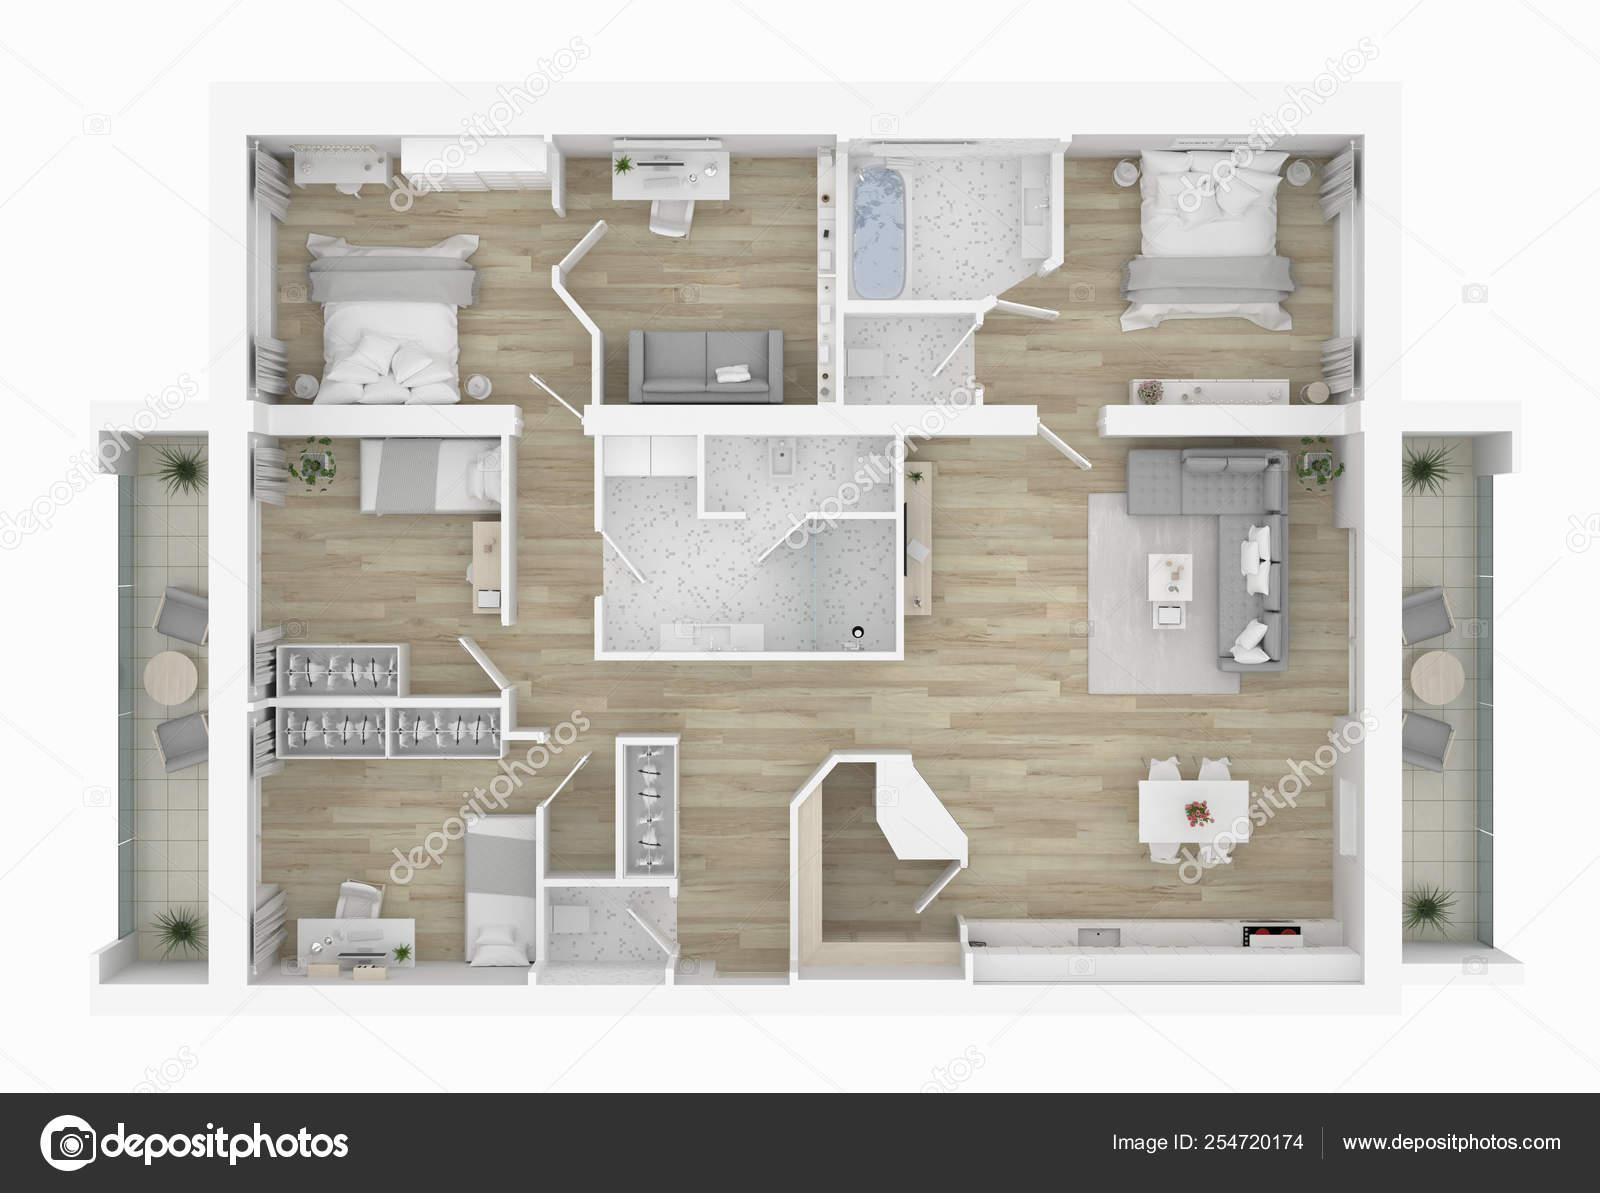 Floor Plan Home Illustration Open Concept Living Apartment Layout Stock Photo C Artjafara 254720174